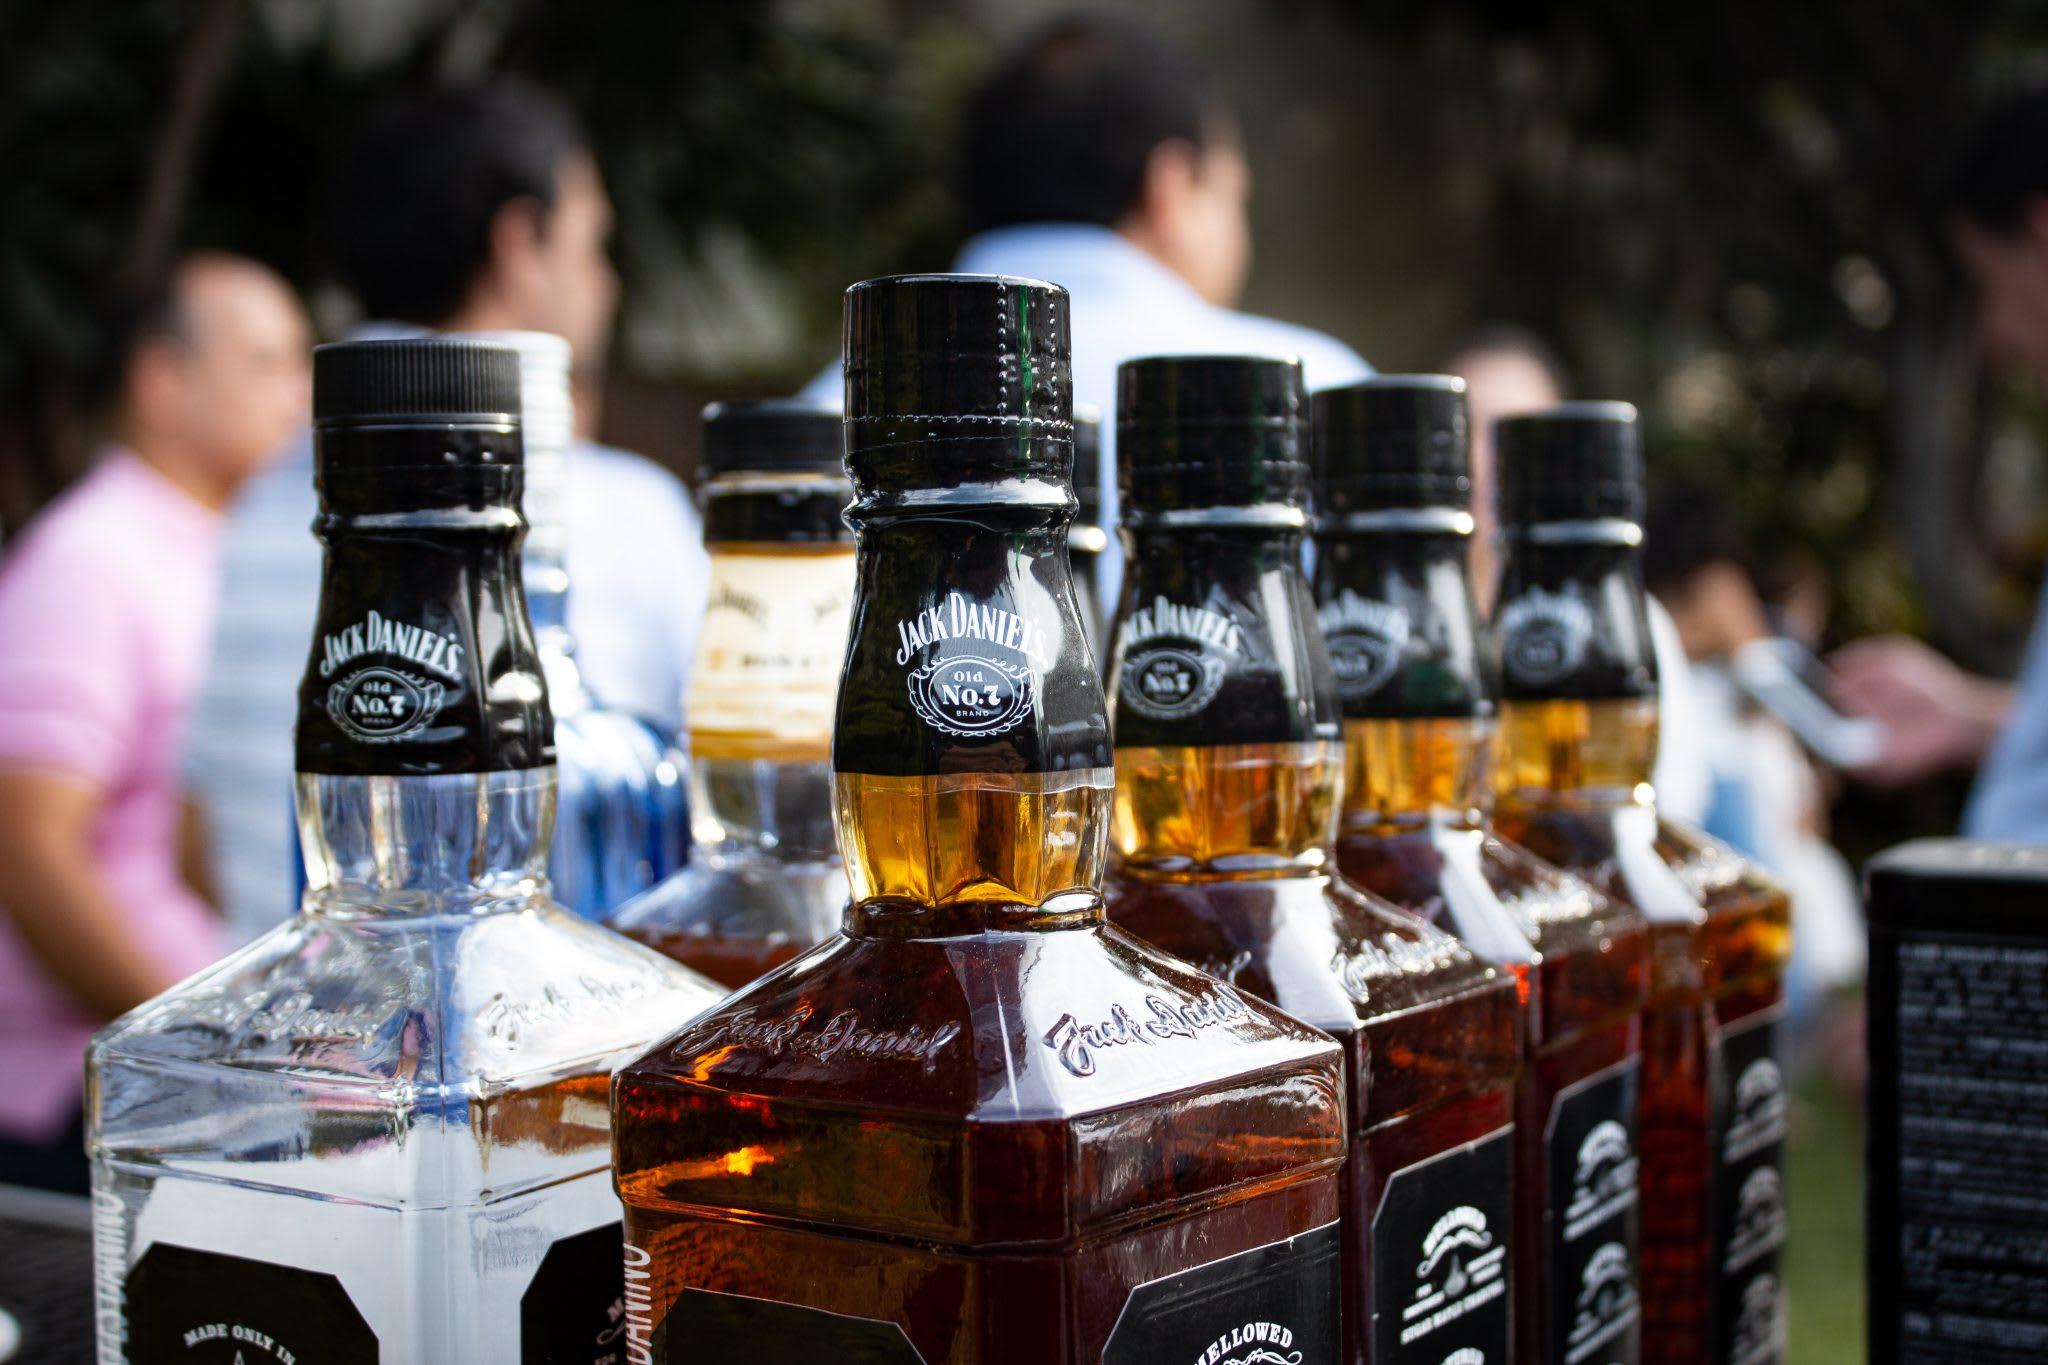 jack daniels, whisky, liquor bottles, people, liquor inventory scale, wisk